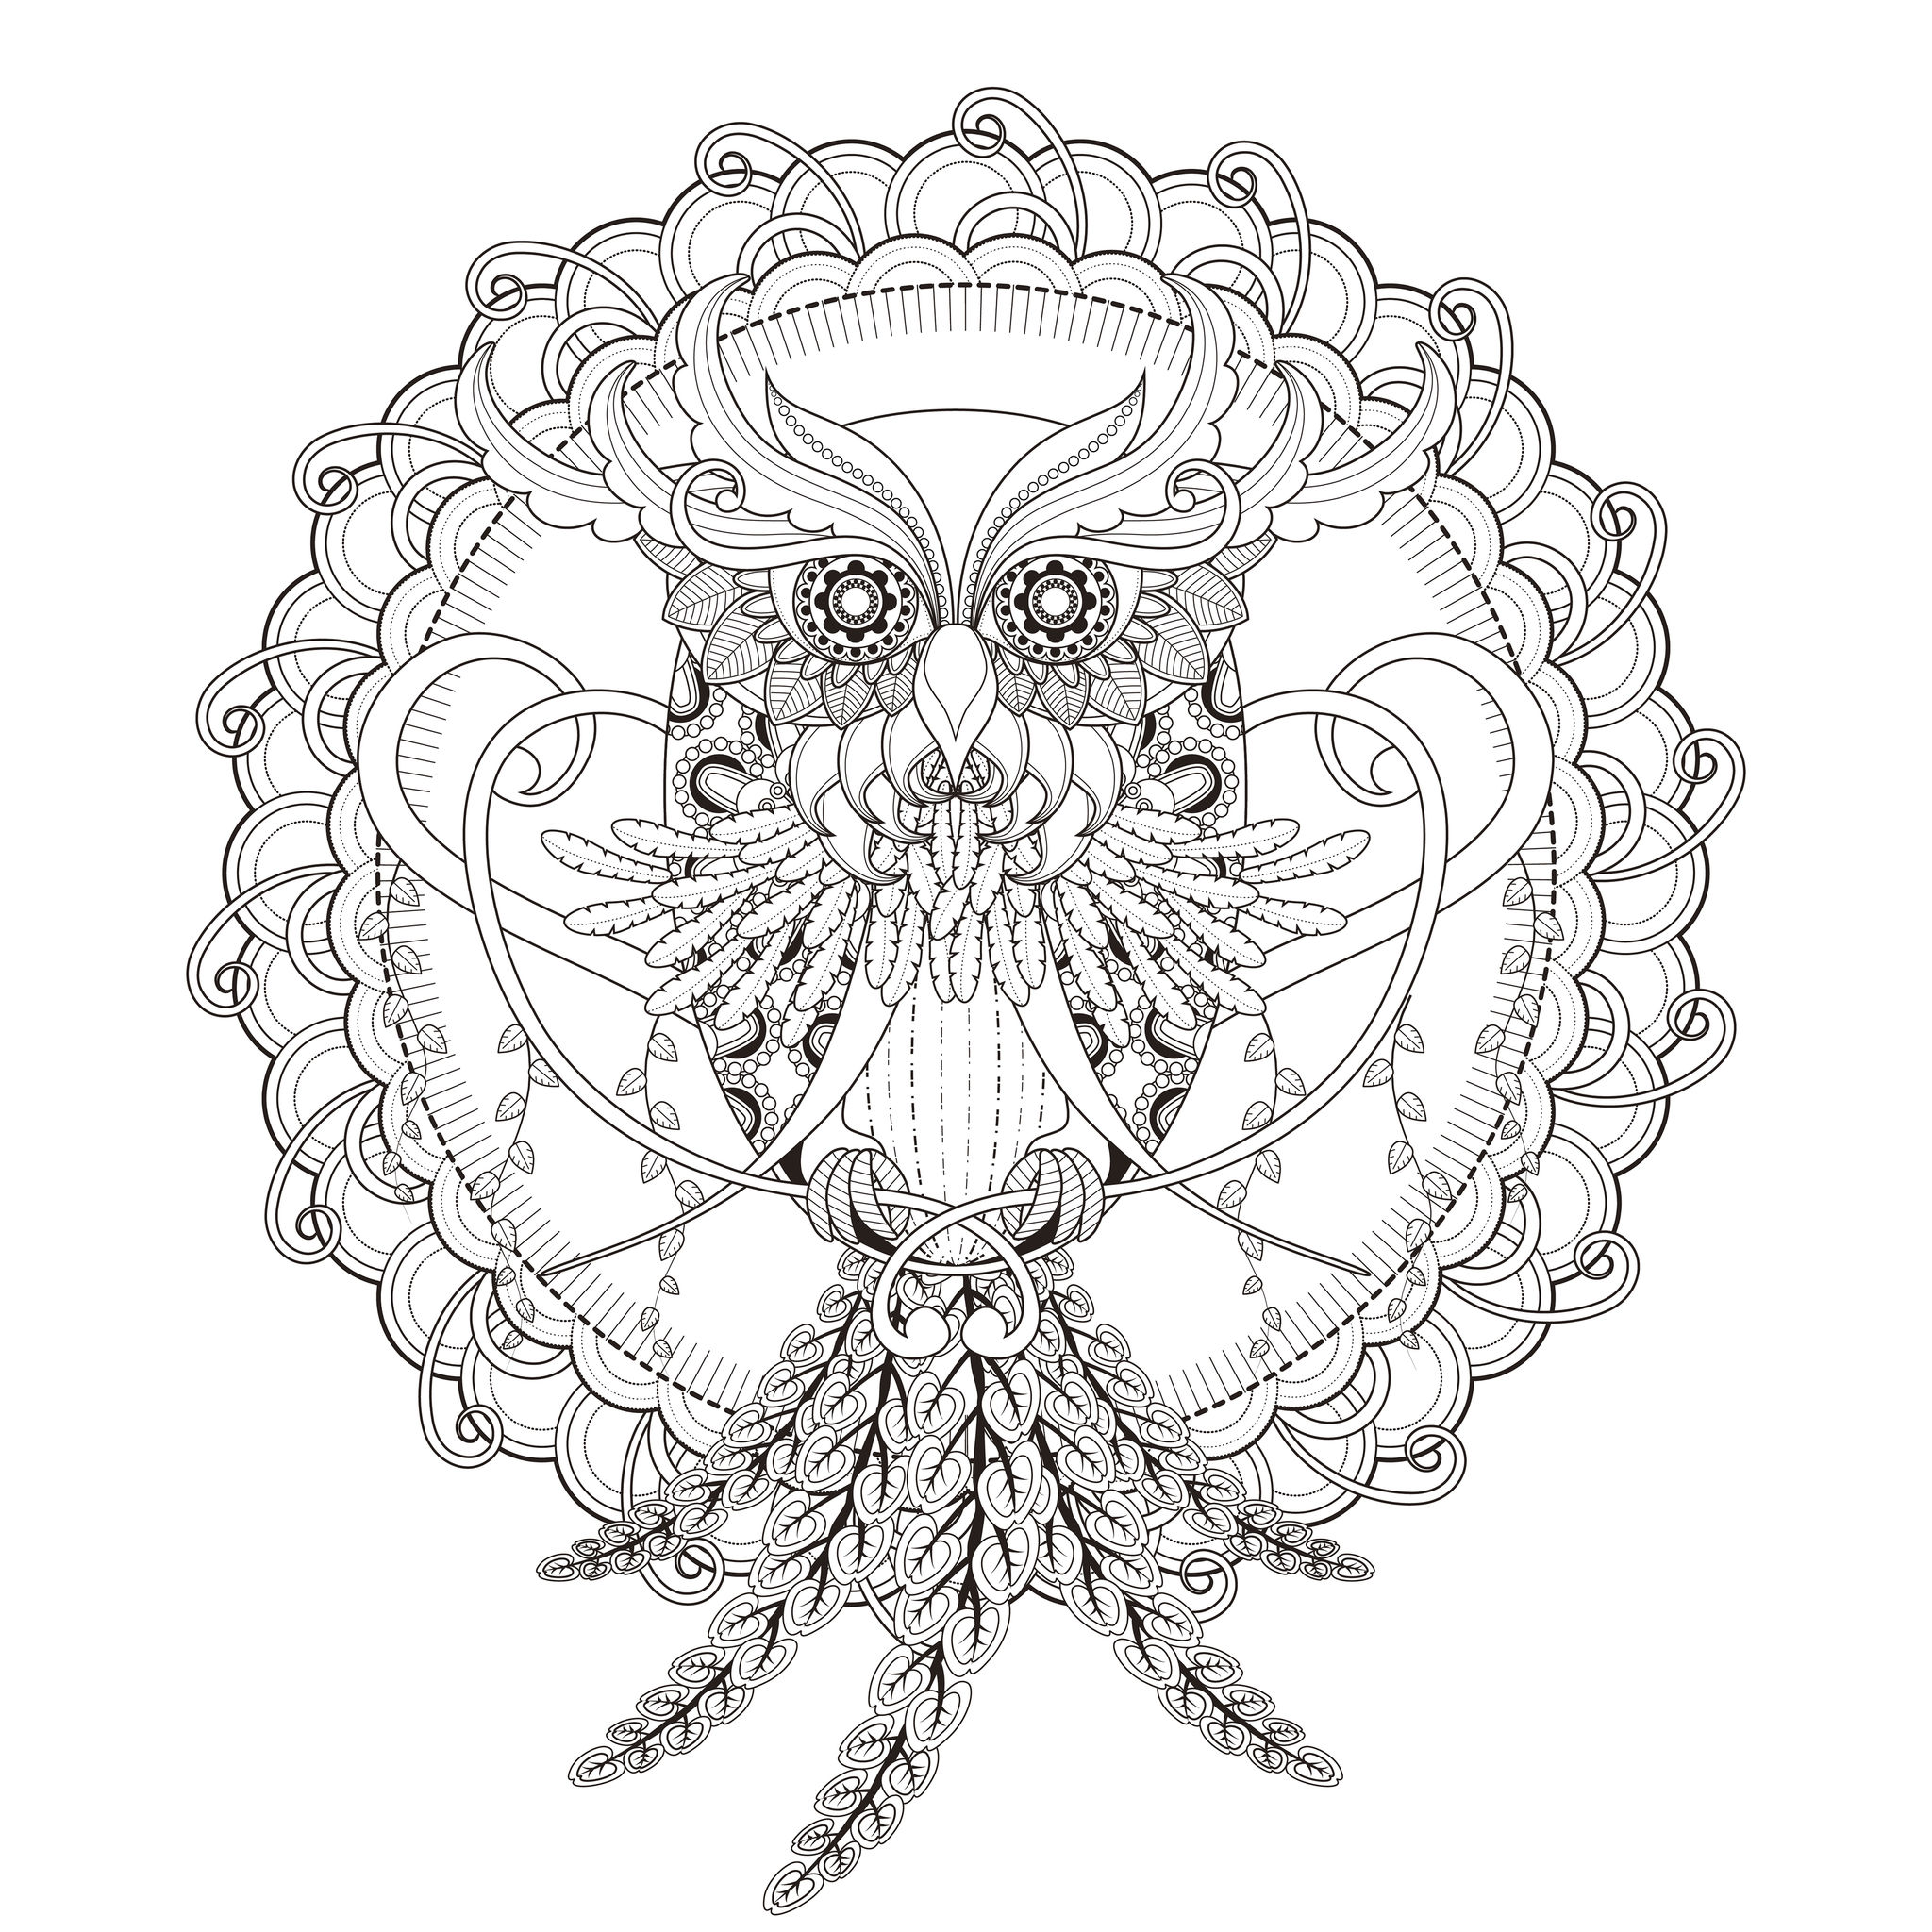 Mandala Owl By Kchung Mandalas Coloring Pages For Adults